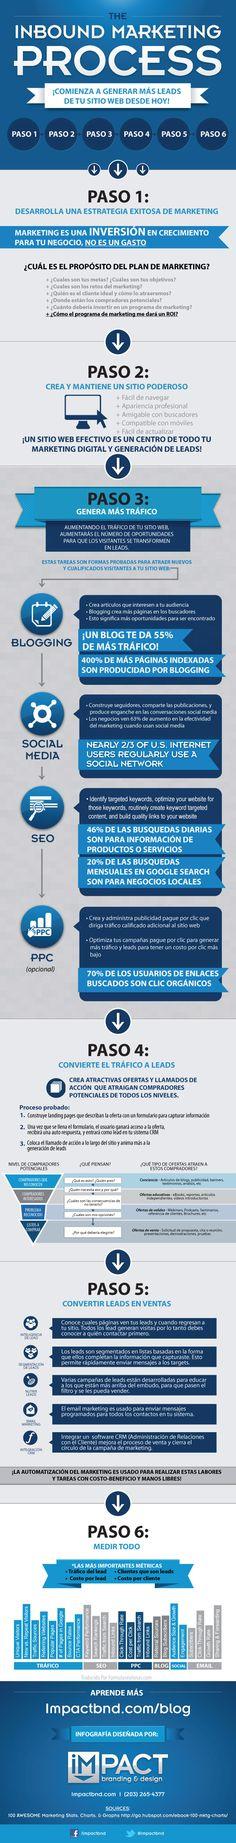 Pasos para una estrategia completa de marketing digital #infografias #marketing buen resumen paso a paso